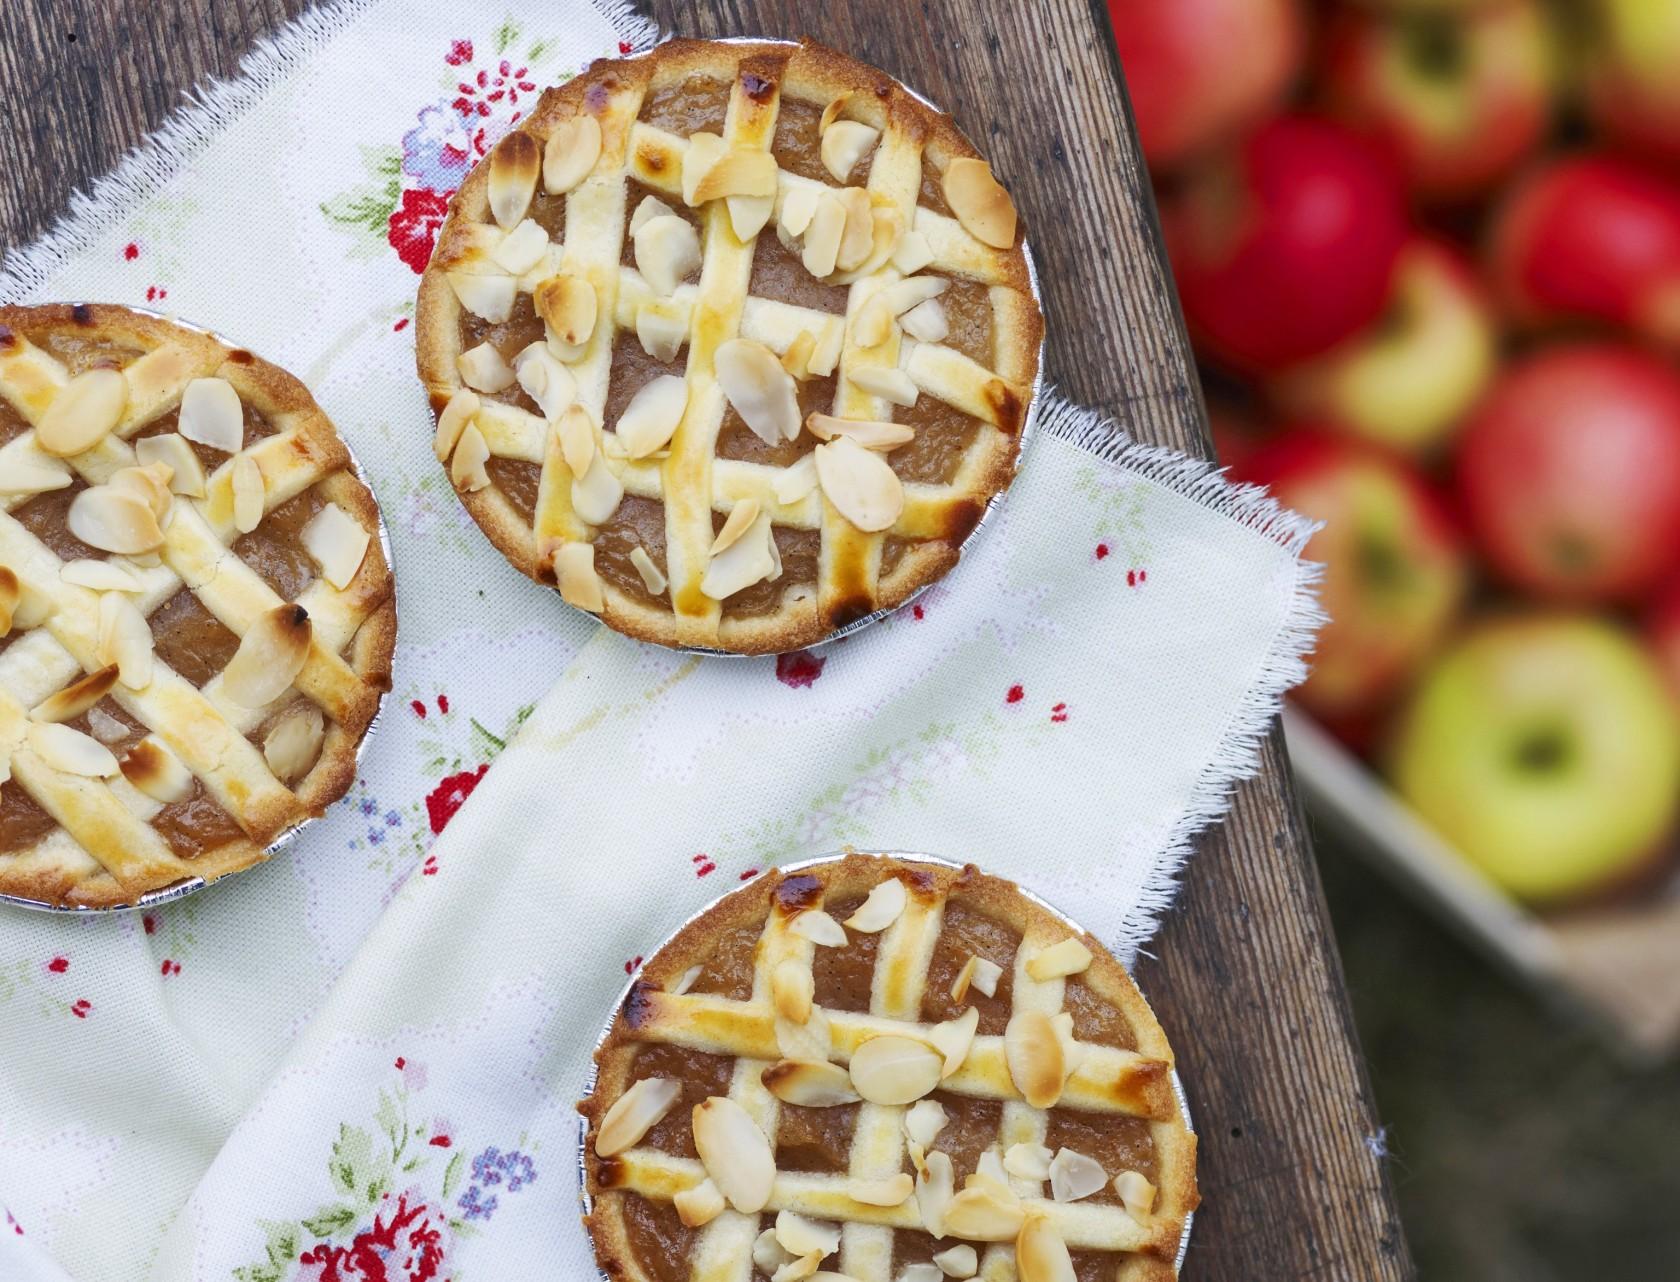 Små æbletærter med fletlåg